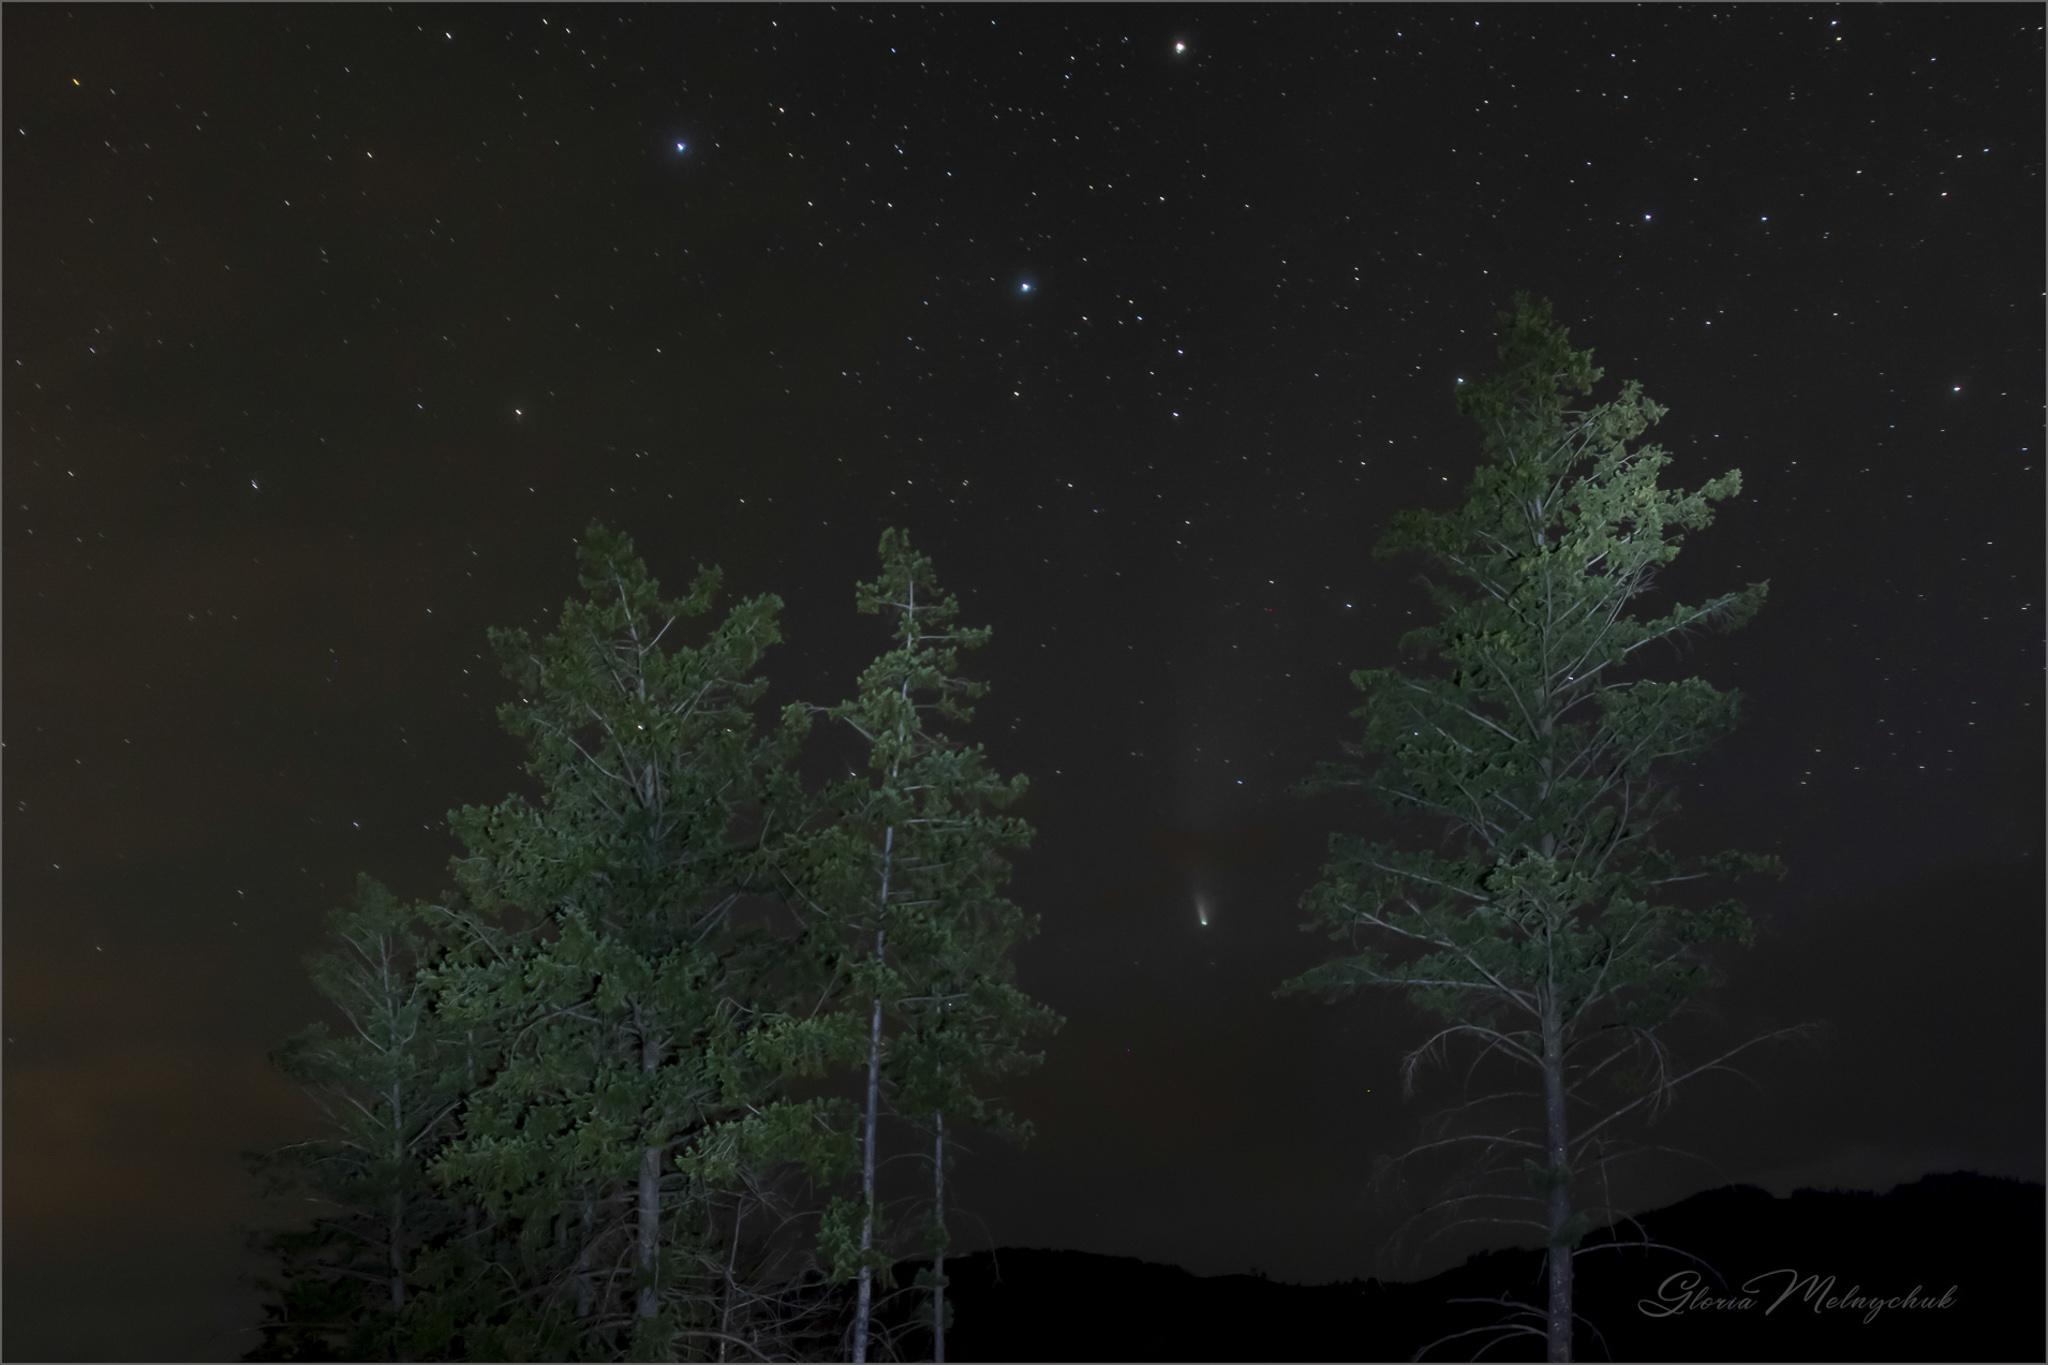 Comet Neowise_GMP2590-198 - Gloria Melnychuk